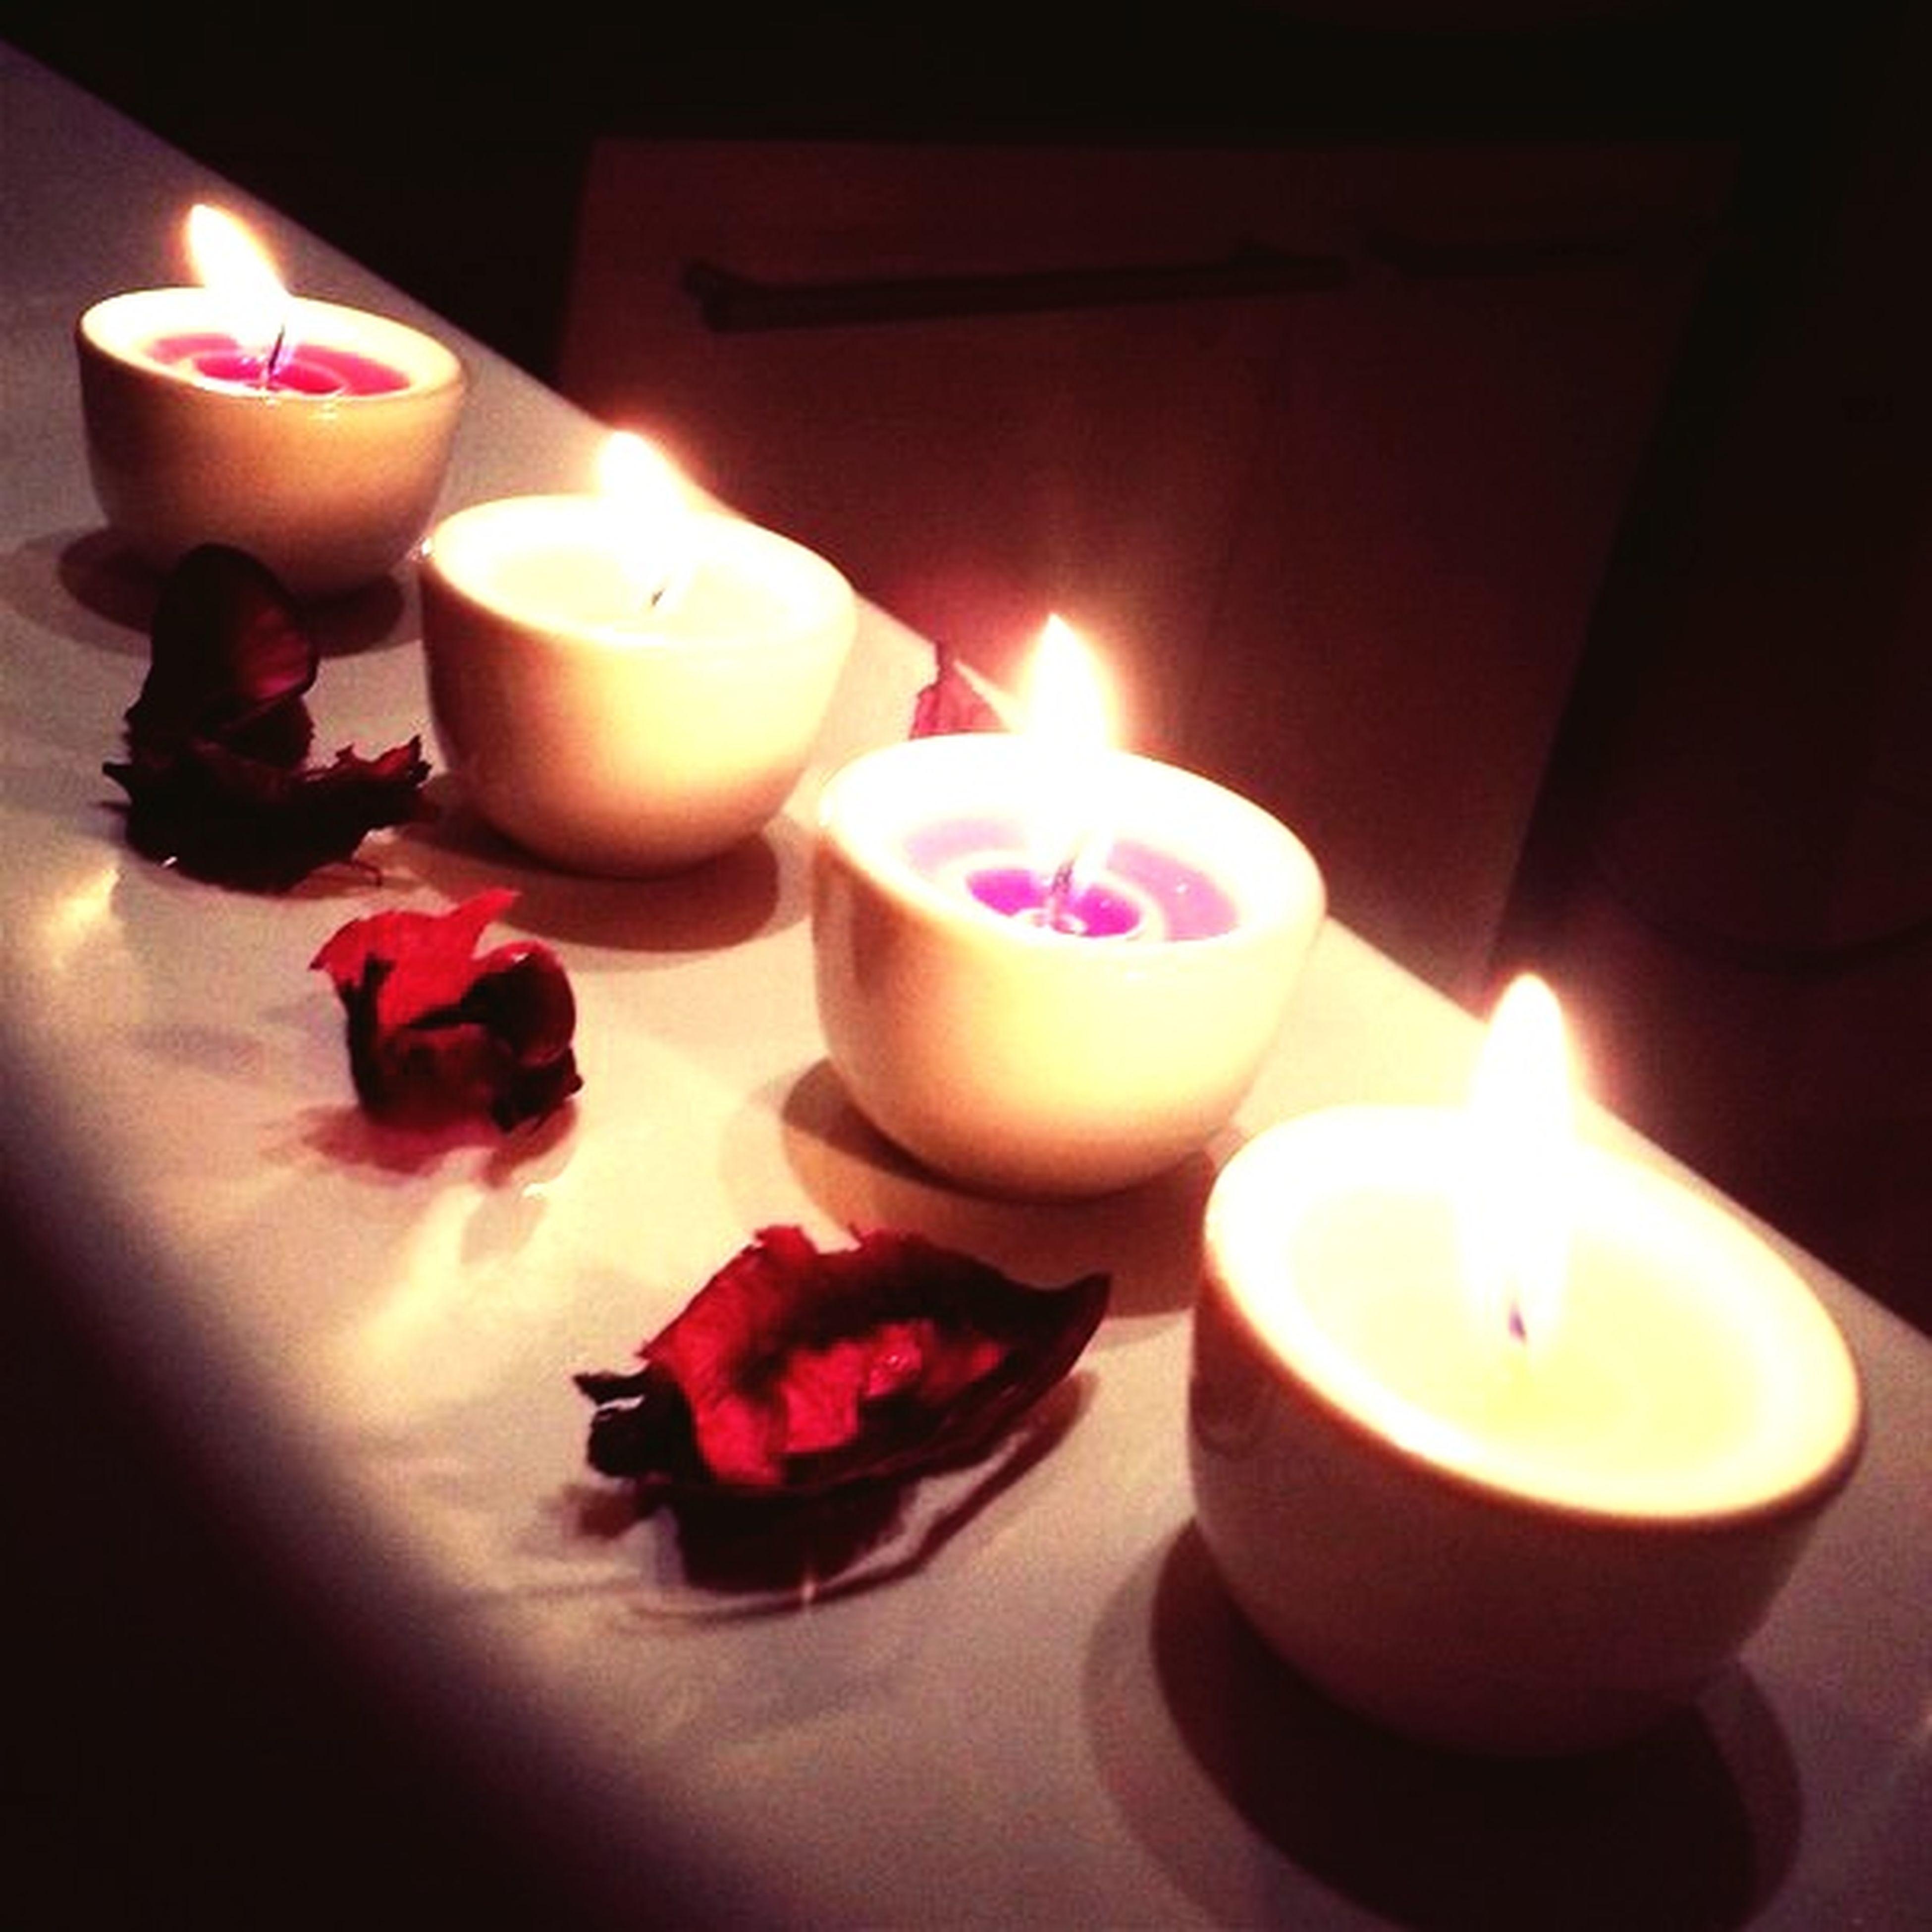 flame, burning, candle, illuminated, fire - natural phenomenon, heat - temperature, glowing, indoors, lit, candlelight, night, fire, celebration, close-up, decoration, tea light, lighting equipment, light - natural phenomenon, dark, no people